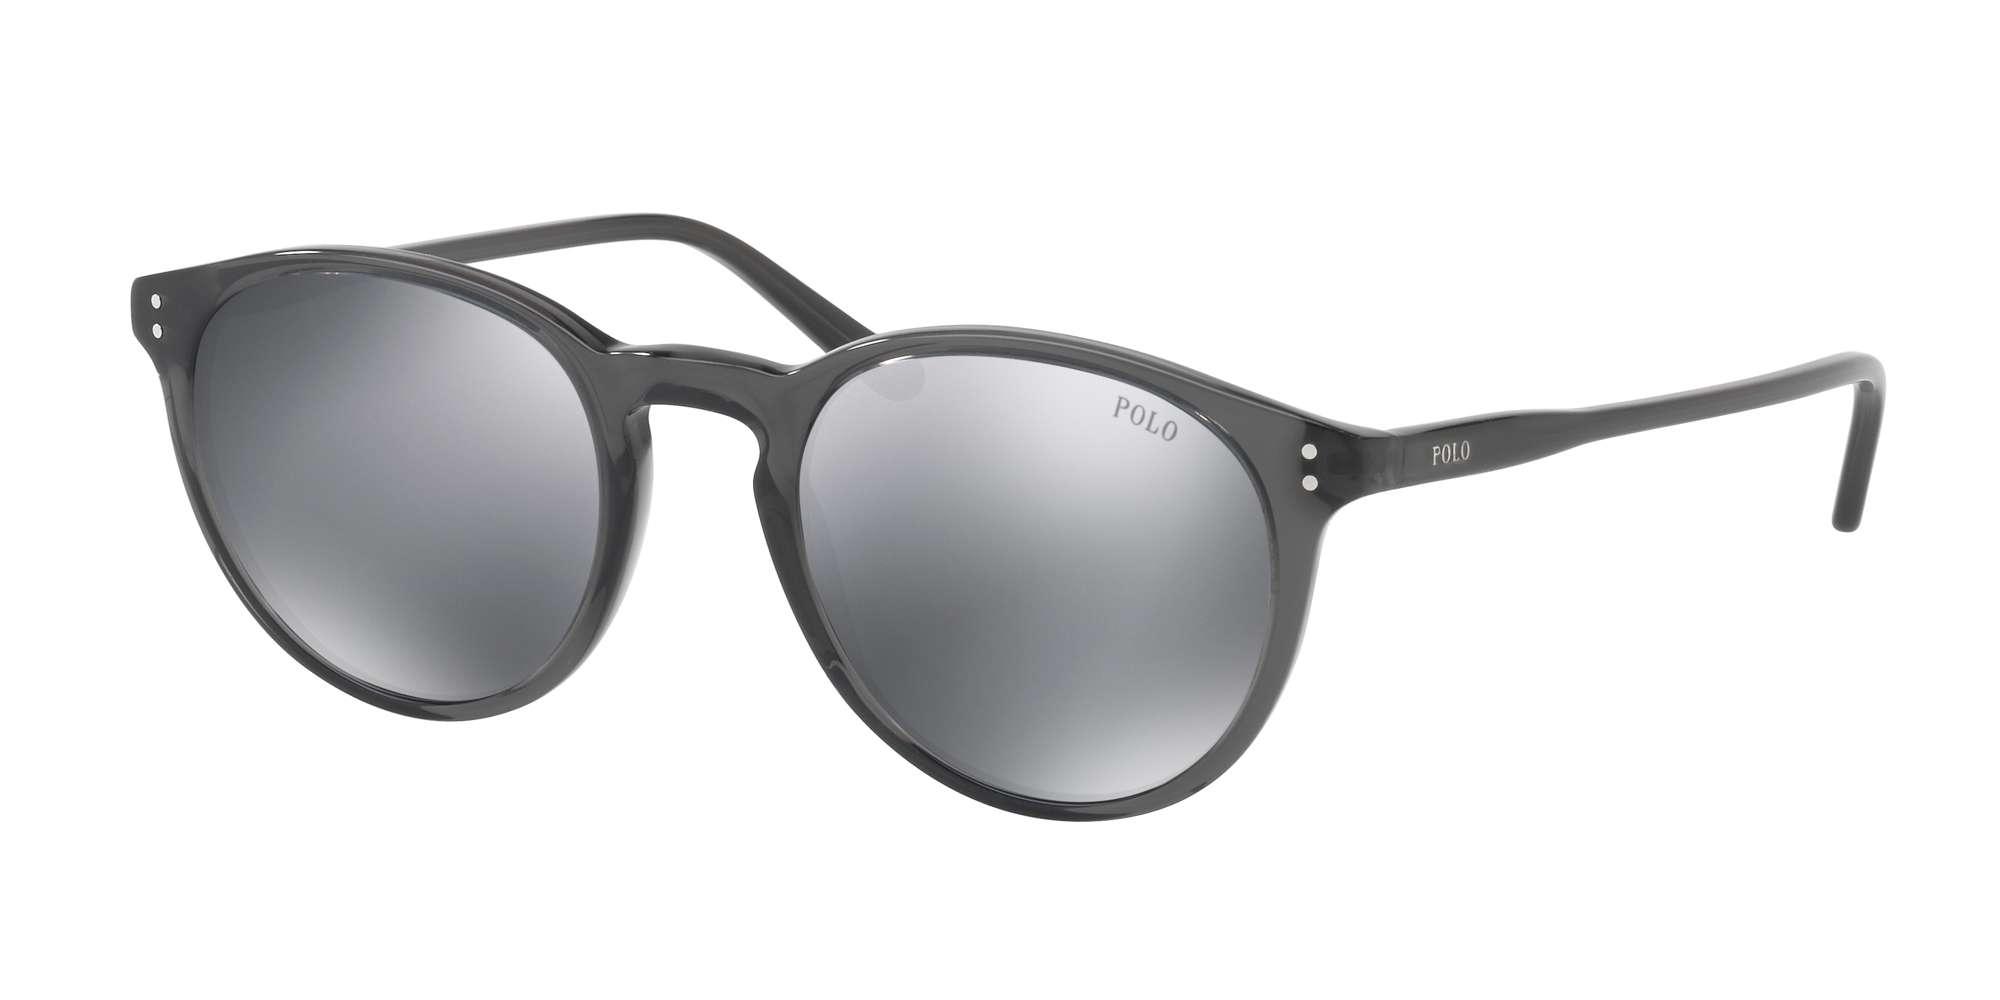 SHINY BLACK CRYSTAL / GREY MIRROR FLASH lenses